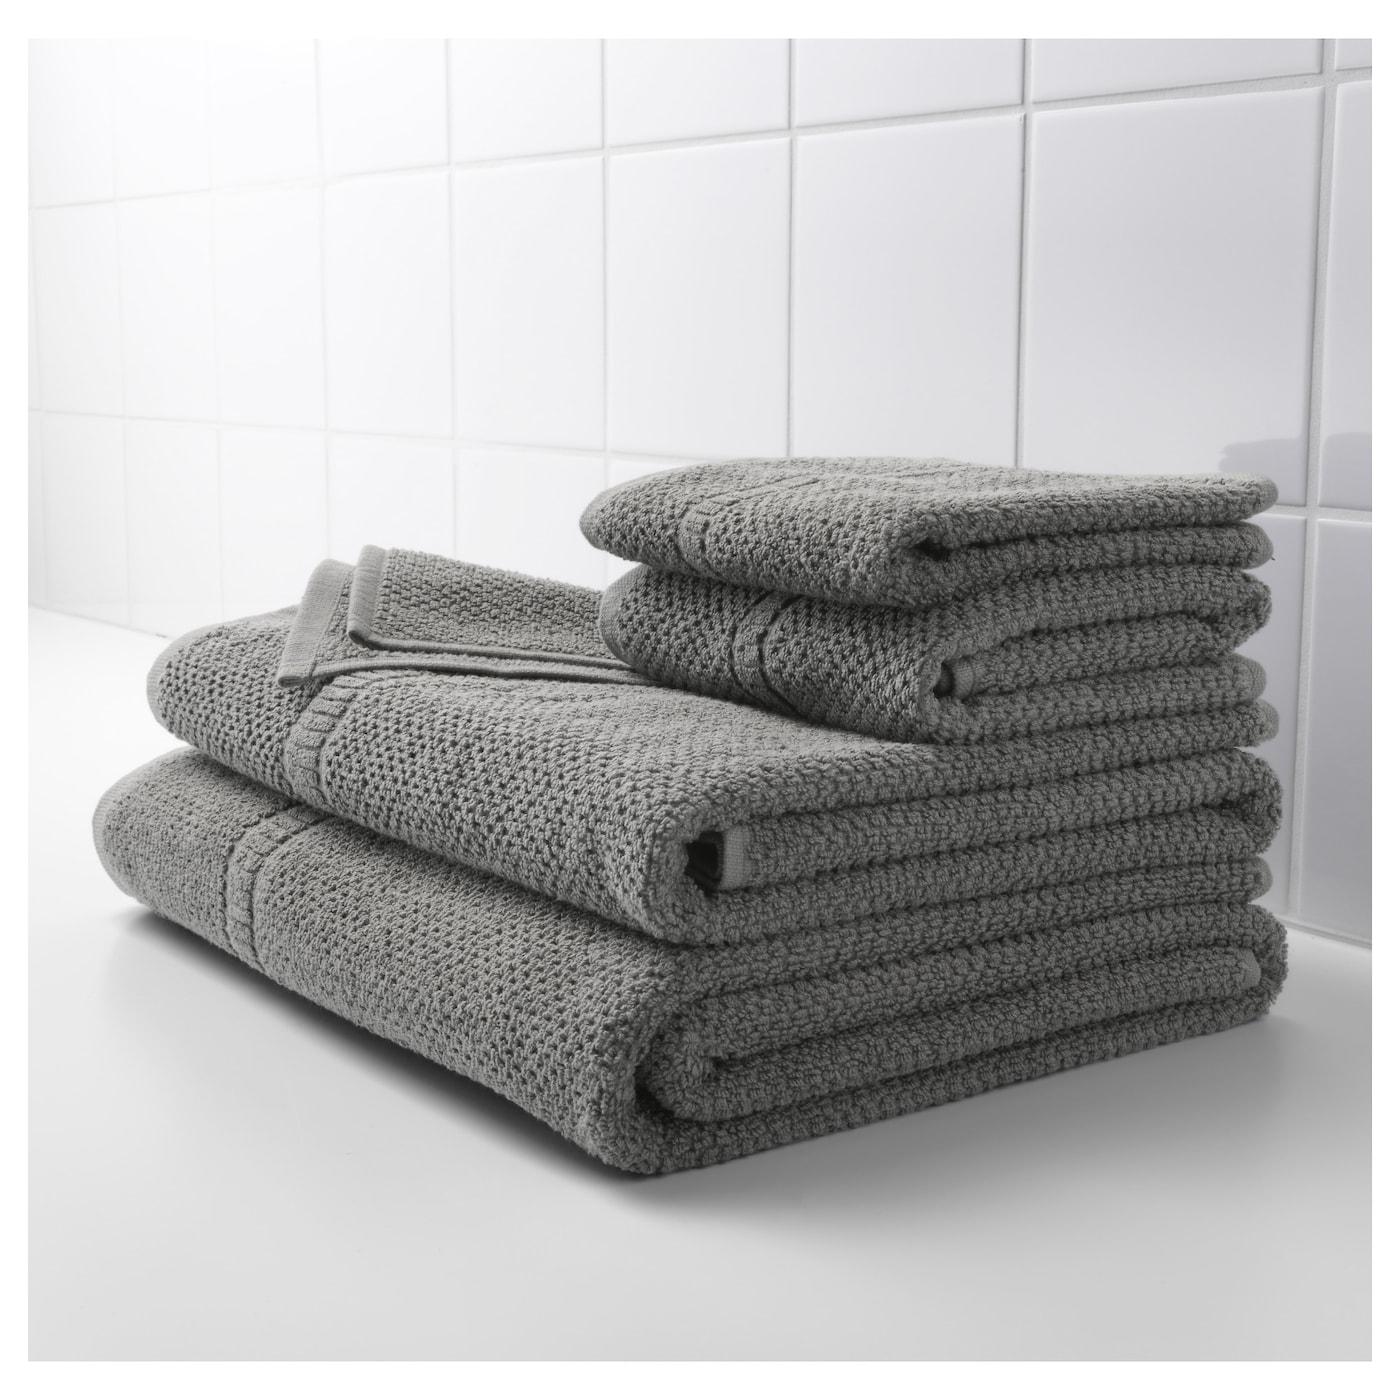 fr jen drap de bain gris 70x140 cm ikea. Black Bedroom Furniture Sets. Home Design Ideas